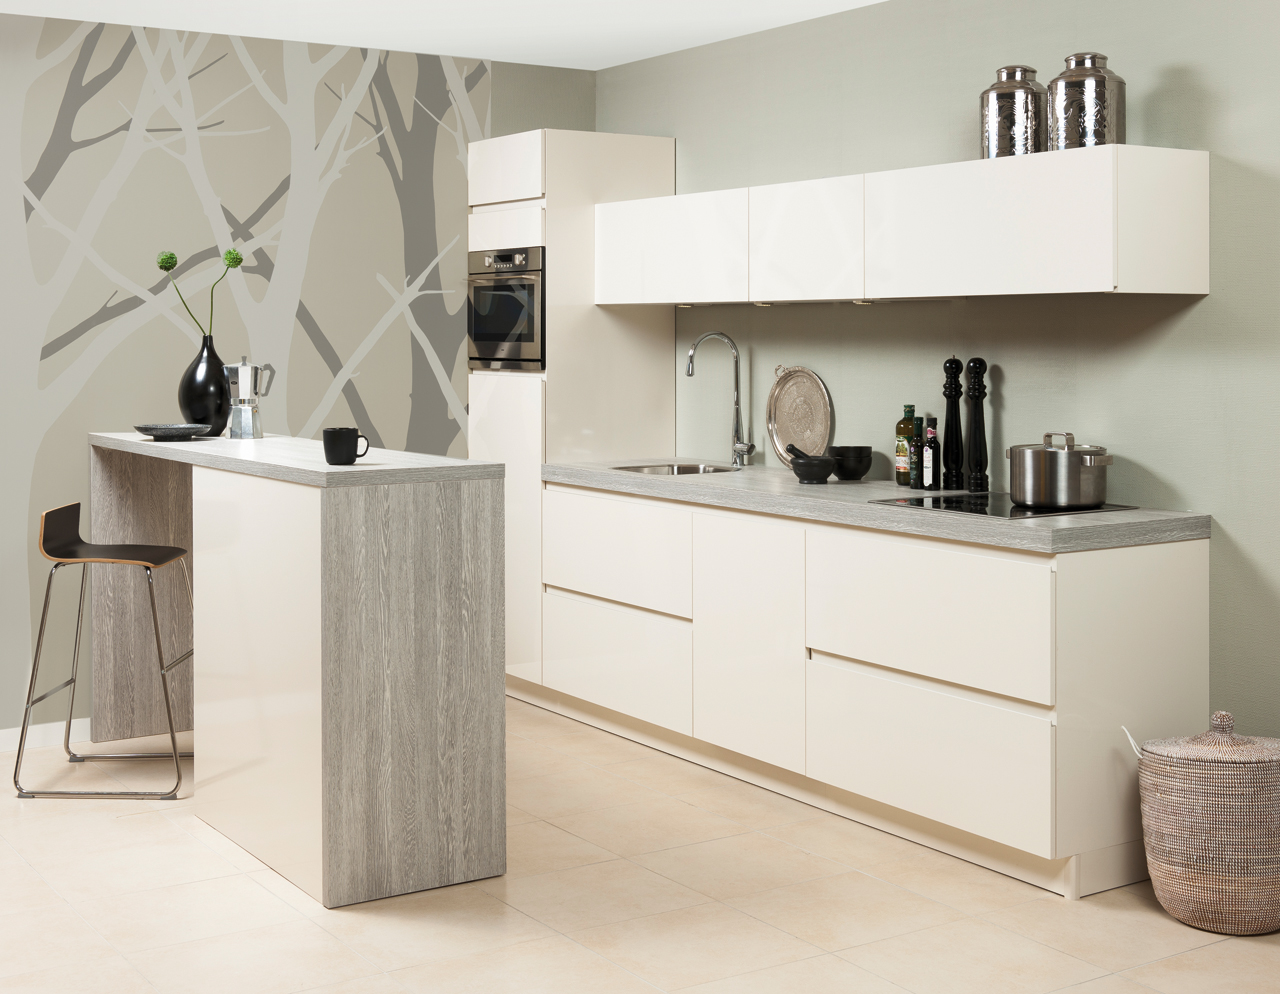 Greeploze Keuken Zelf Maken : Keuken Onna Collexion Greeploos – Grando Keukens & Bad Zaandam